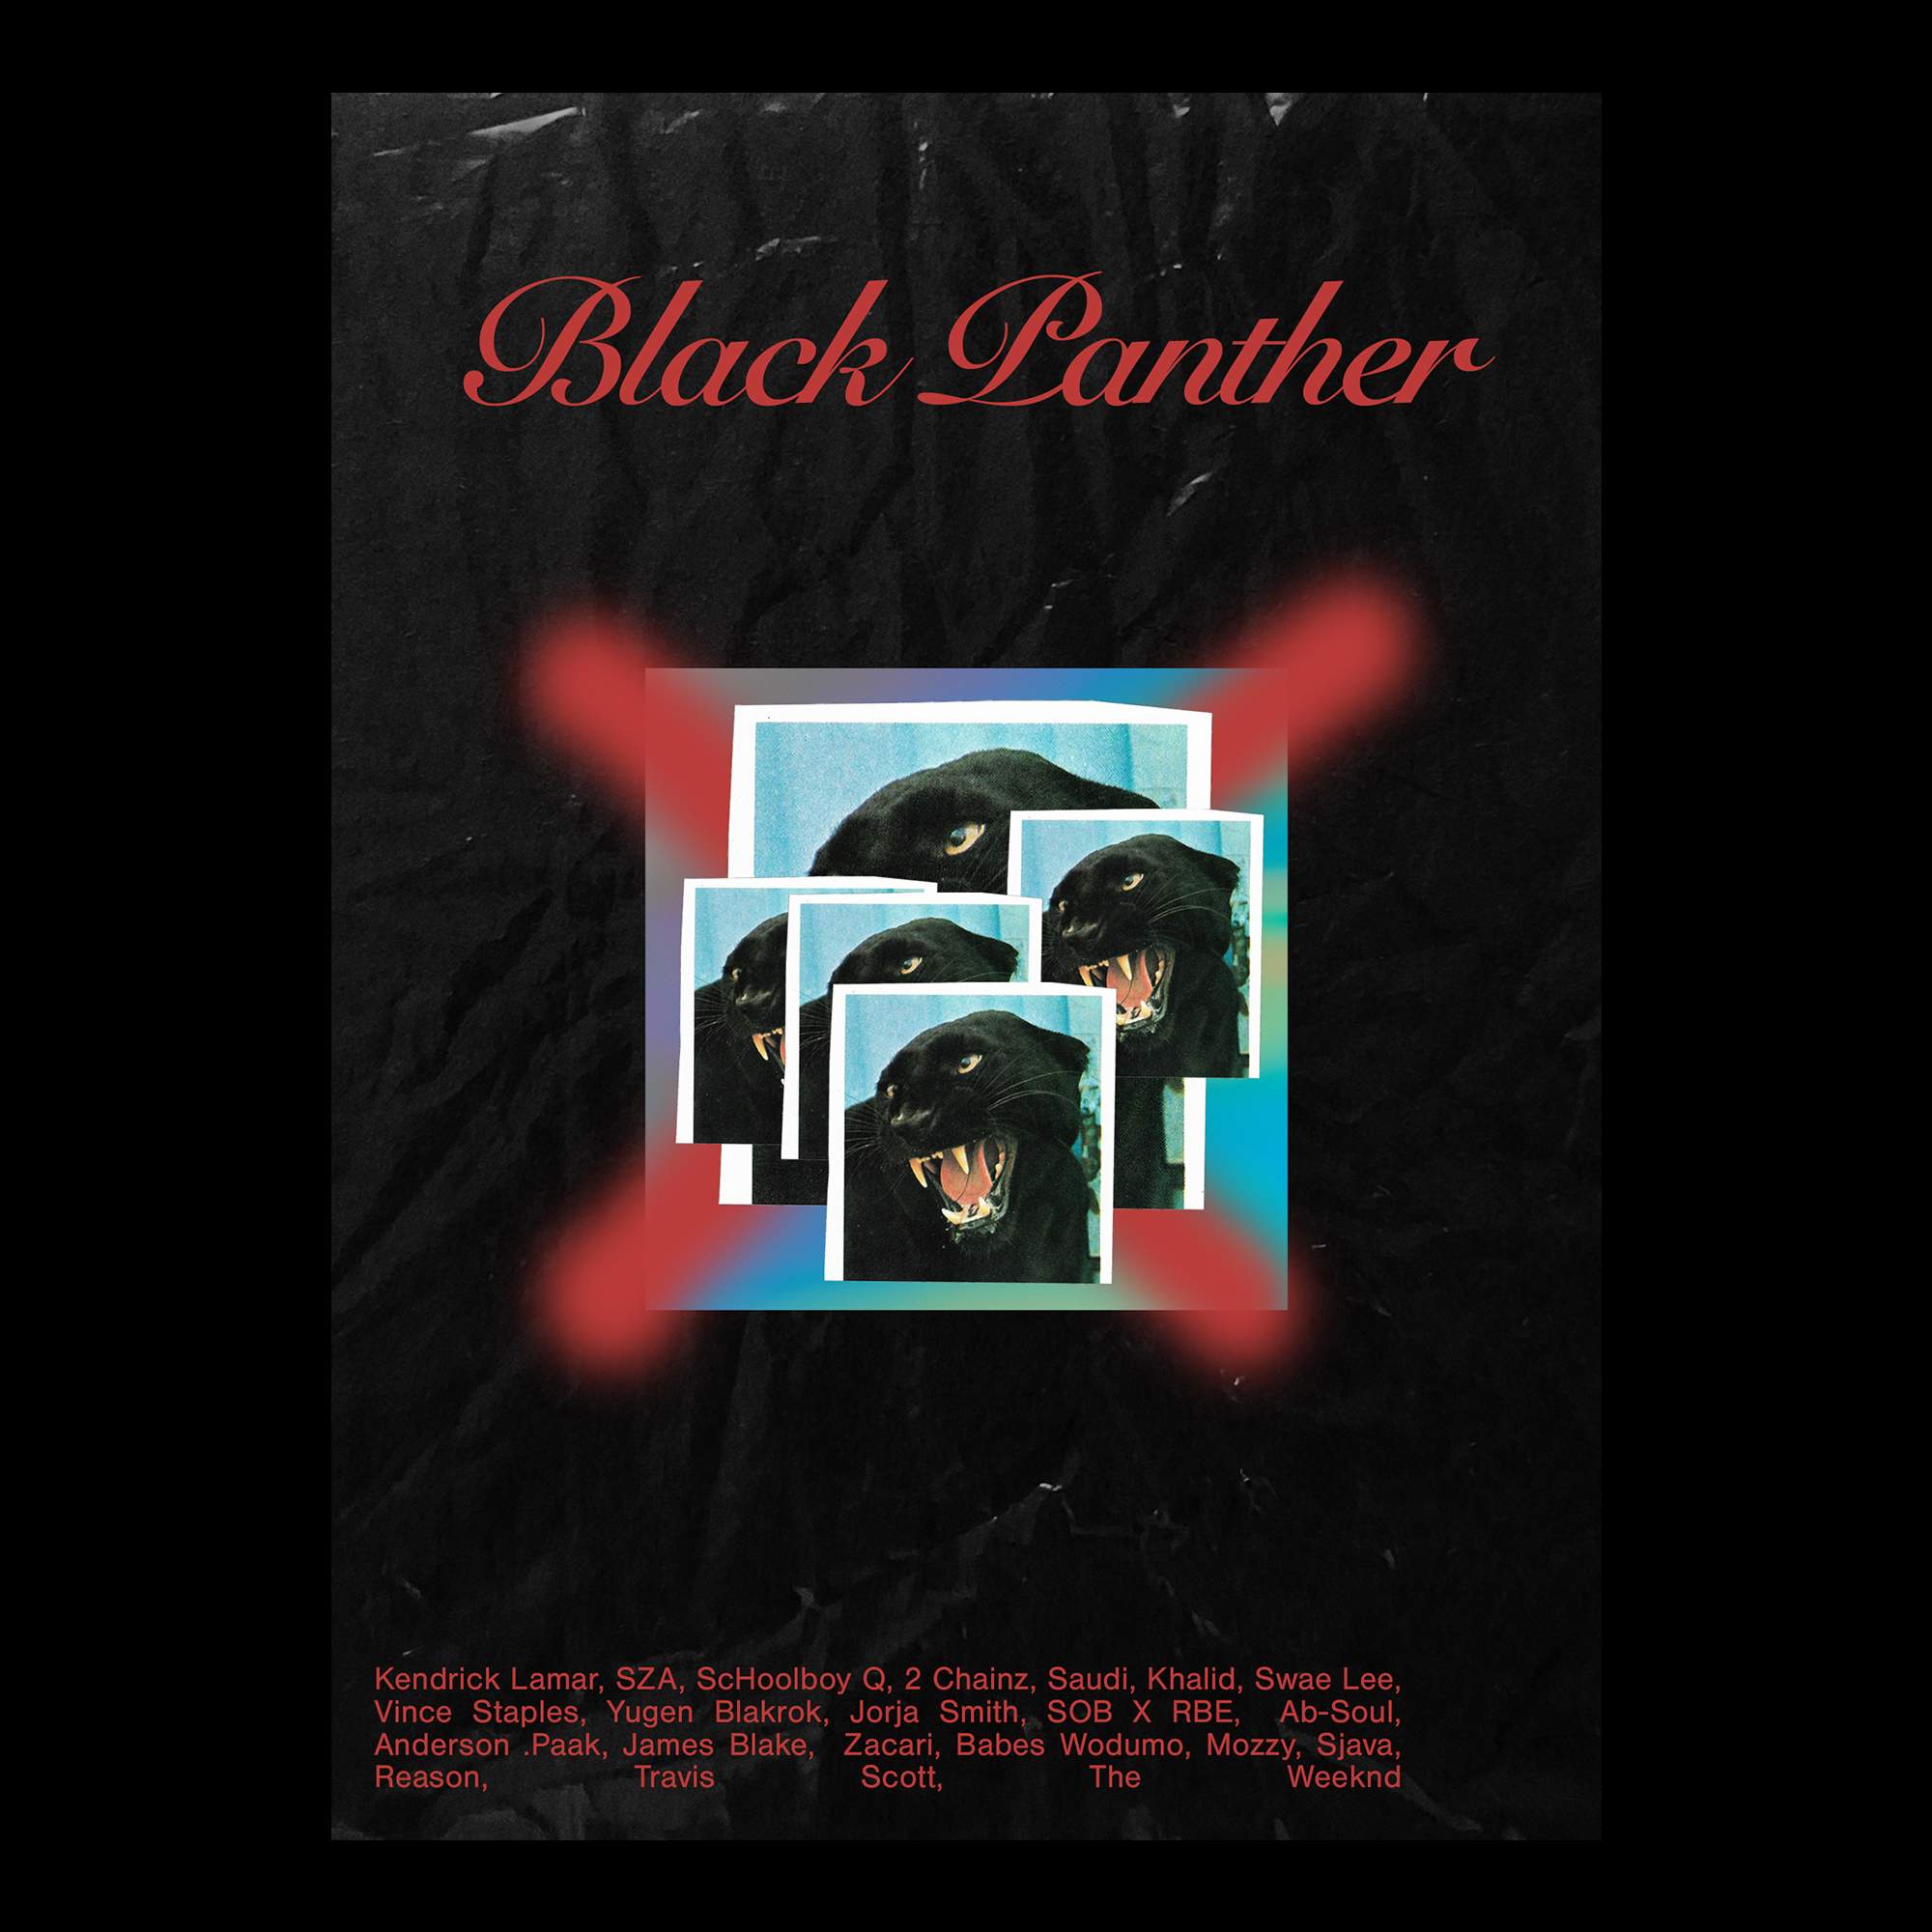 black-panther_poster-instagram.jpg